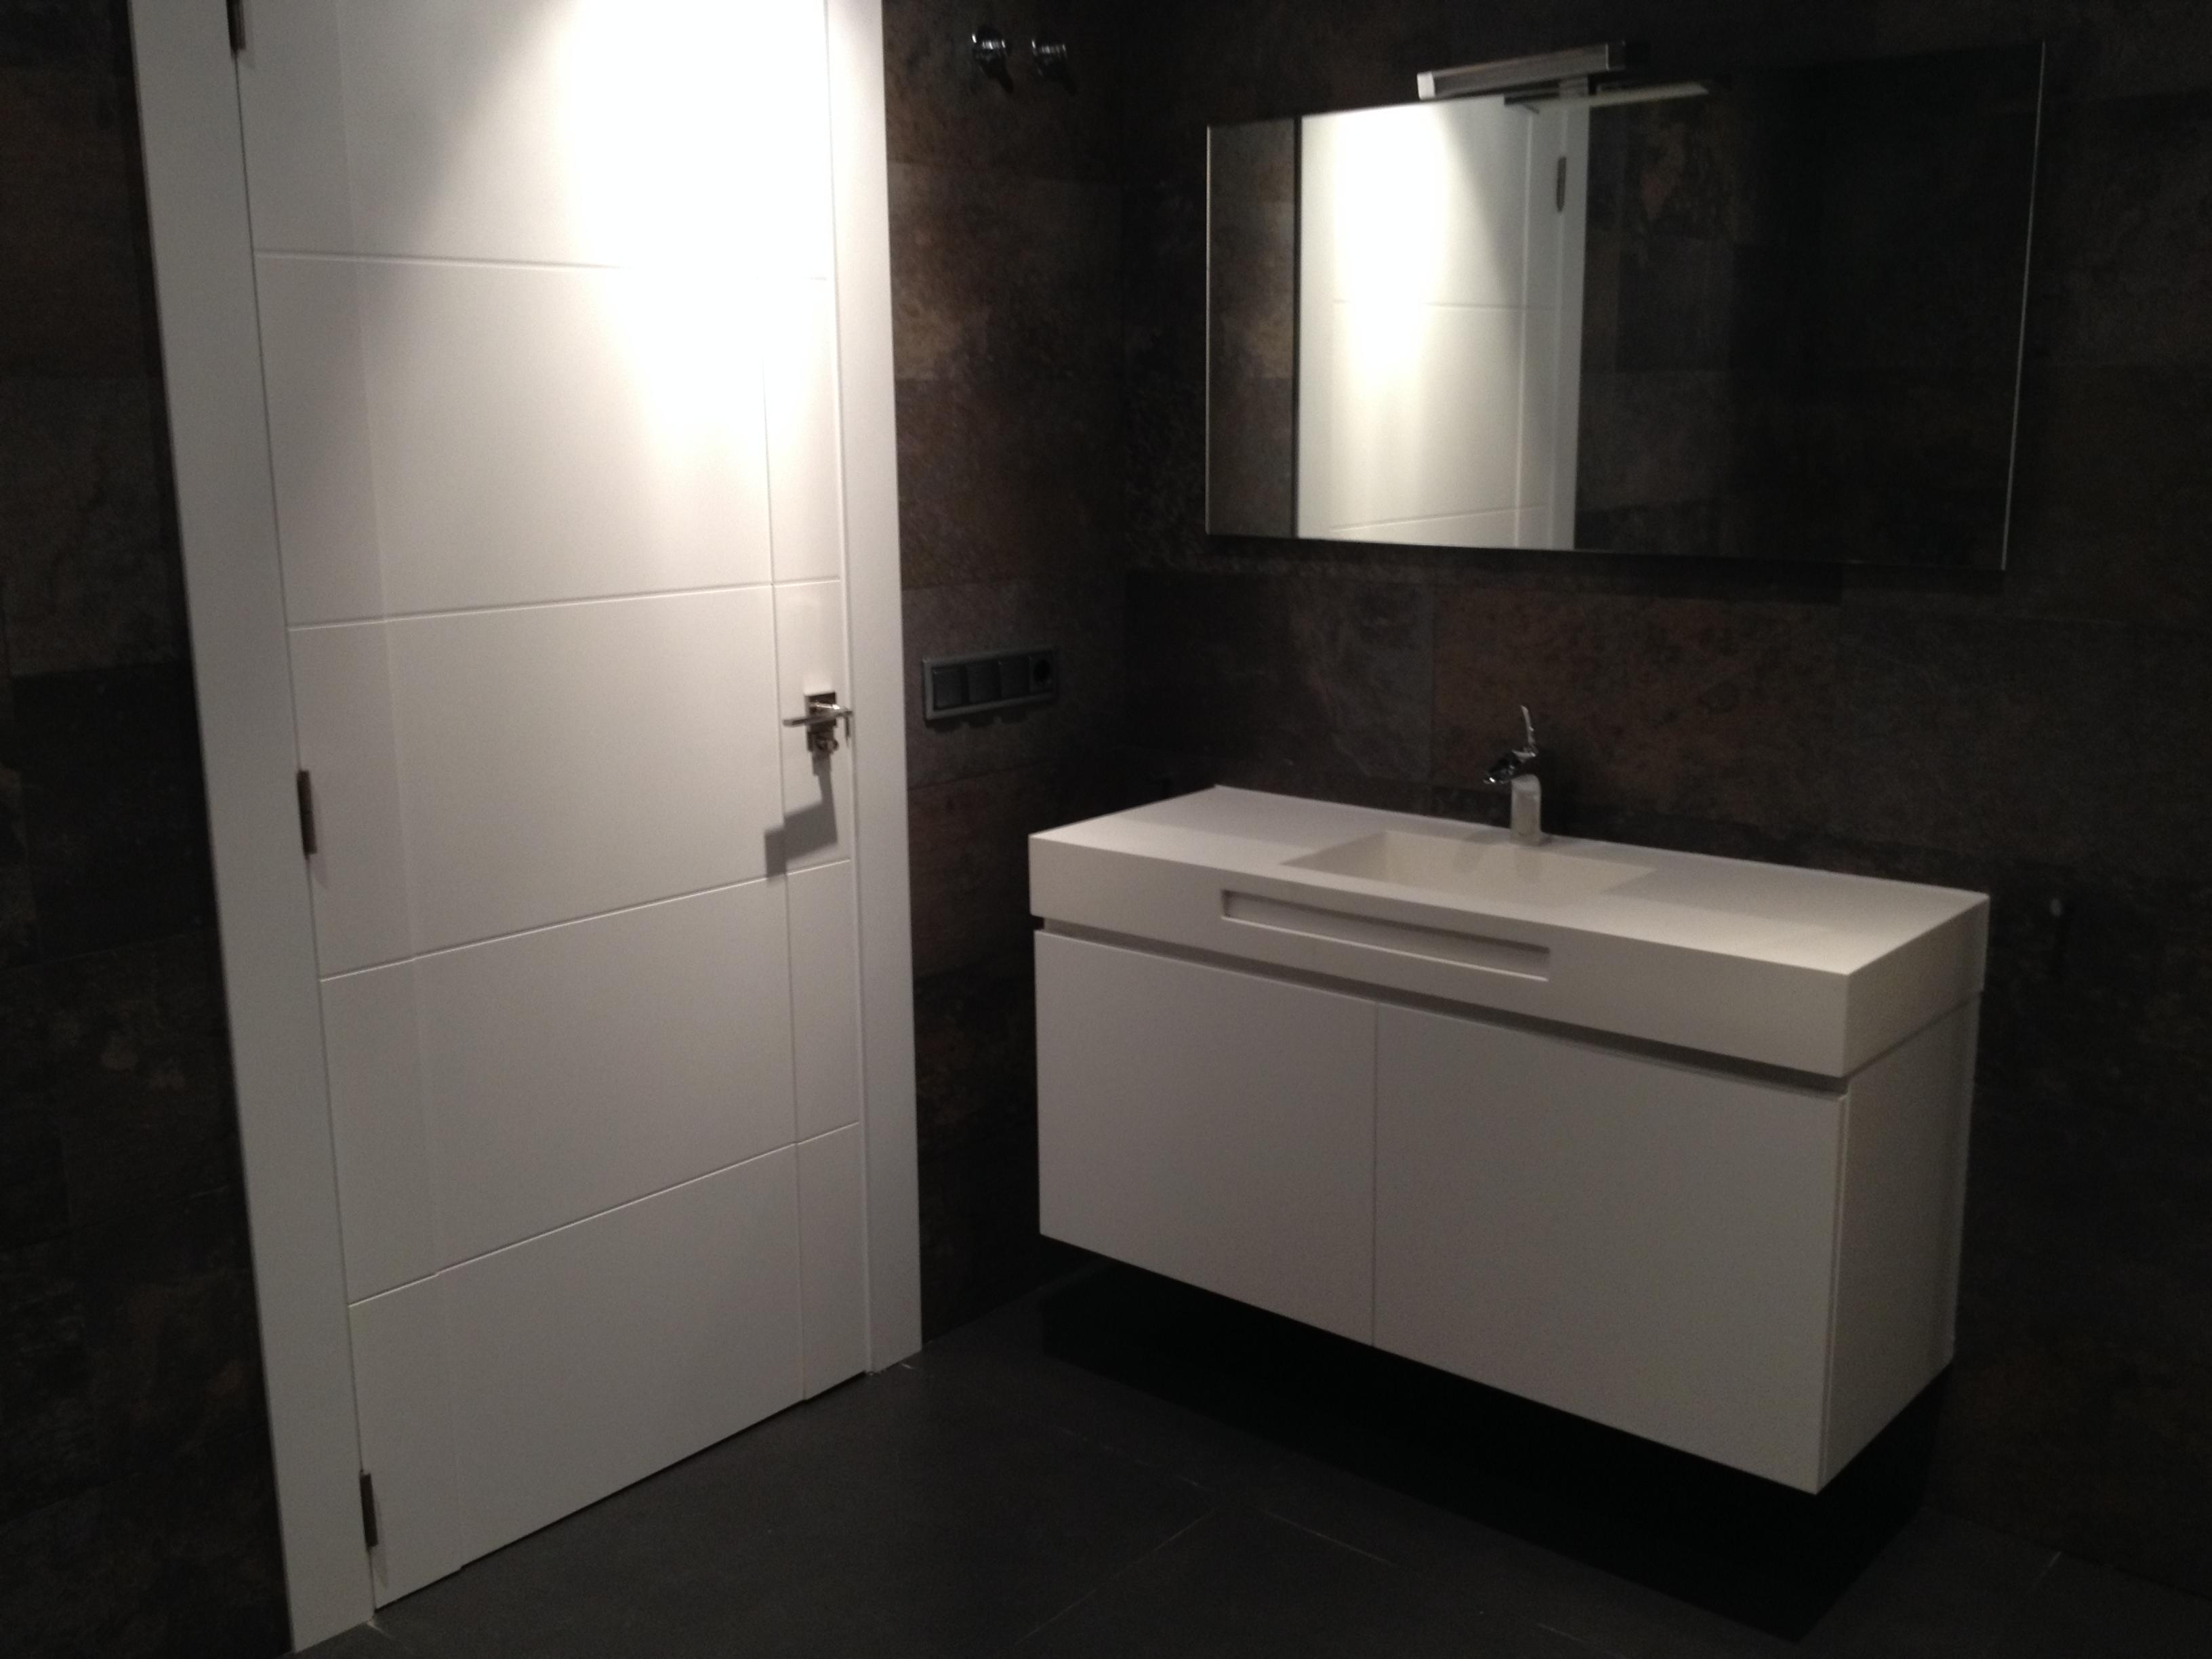 Fabrica fabricacion cuartos bano a medida valencia 8 for Fabrica muebles valencia